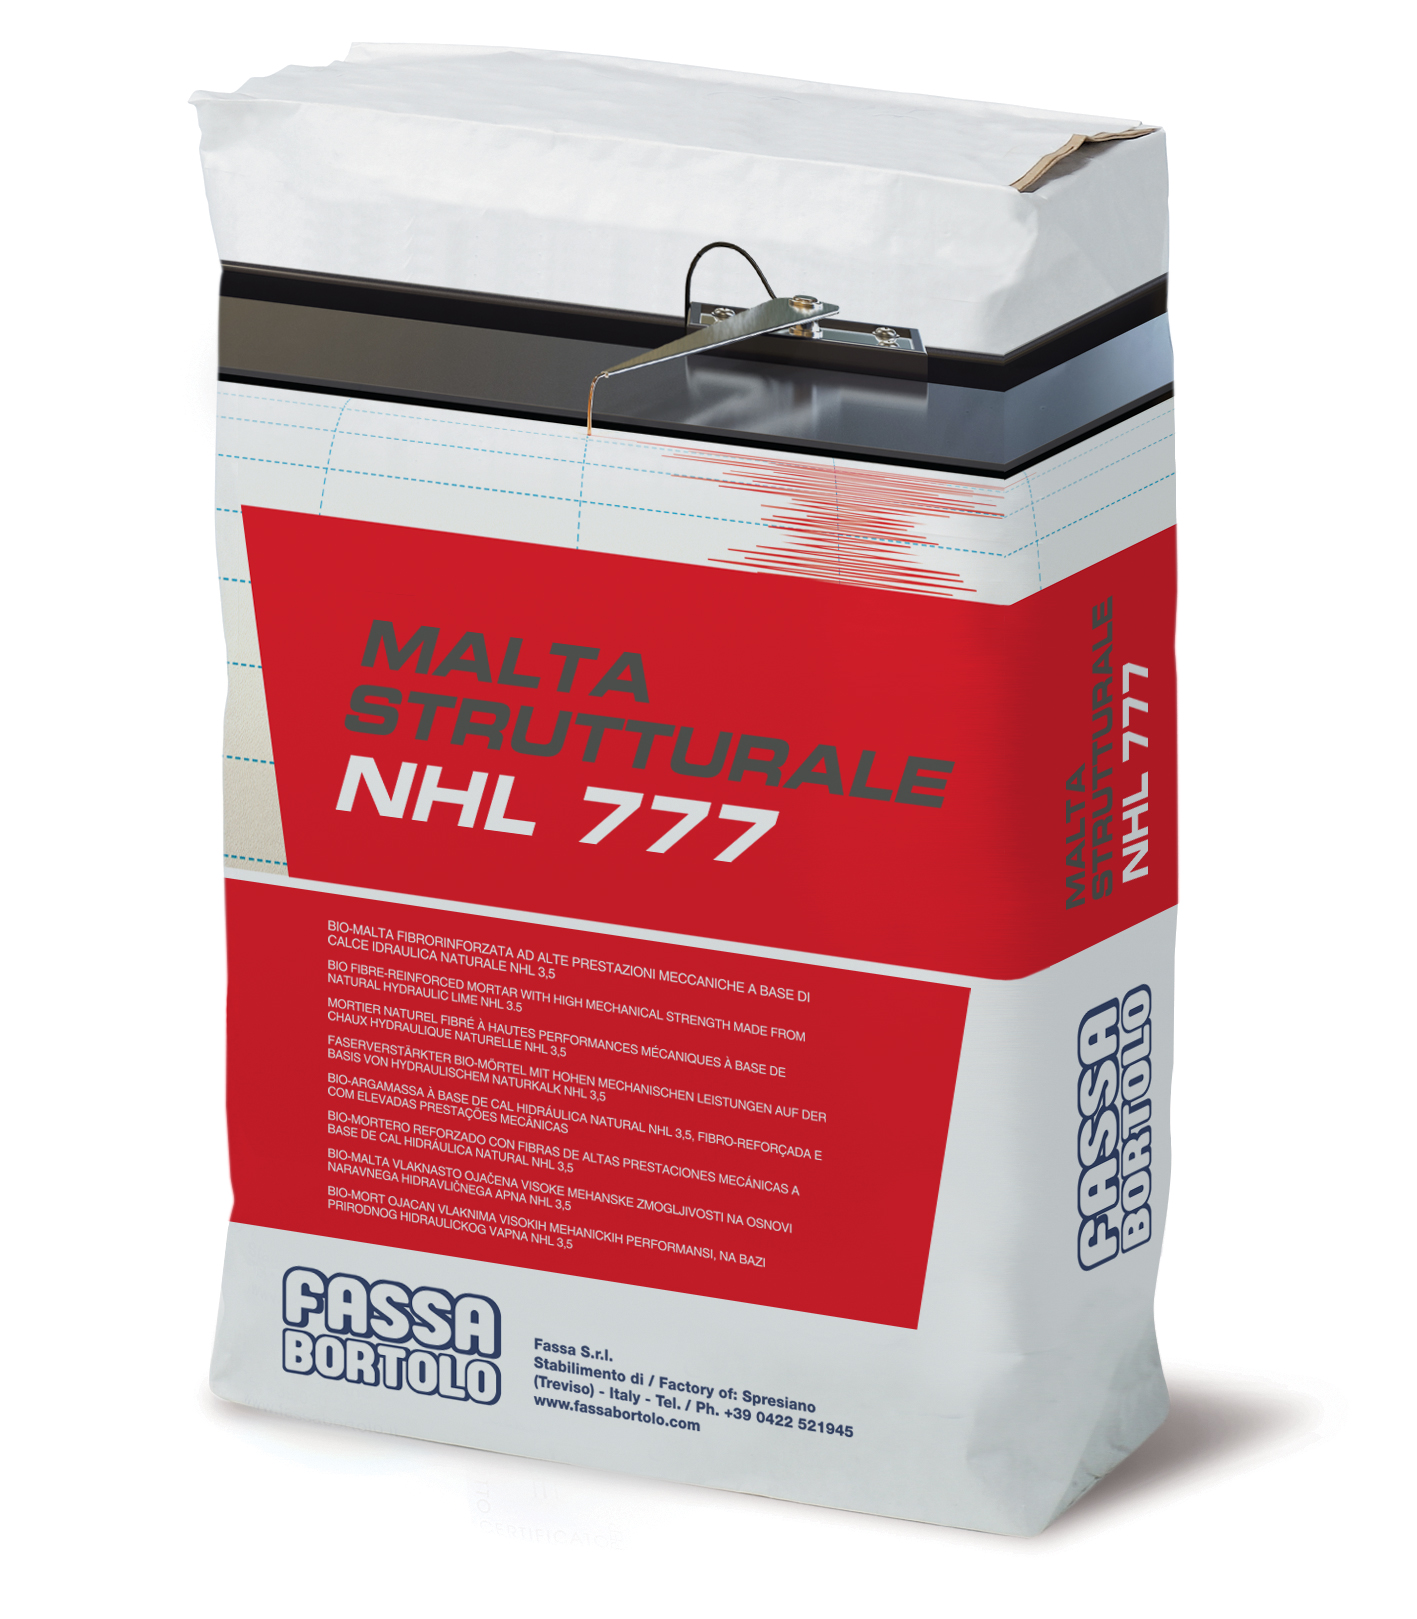 MALTA STRUTTURALE NHL 777: Bio-malta fibrorinforzata strutturale a base di calce idraulica naturale NHL 3,5 per interni ed esterni